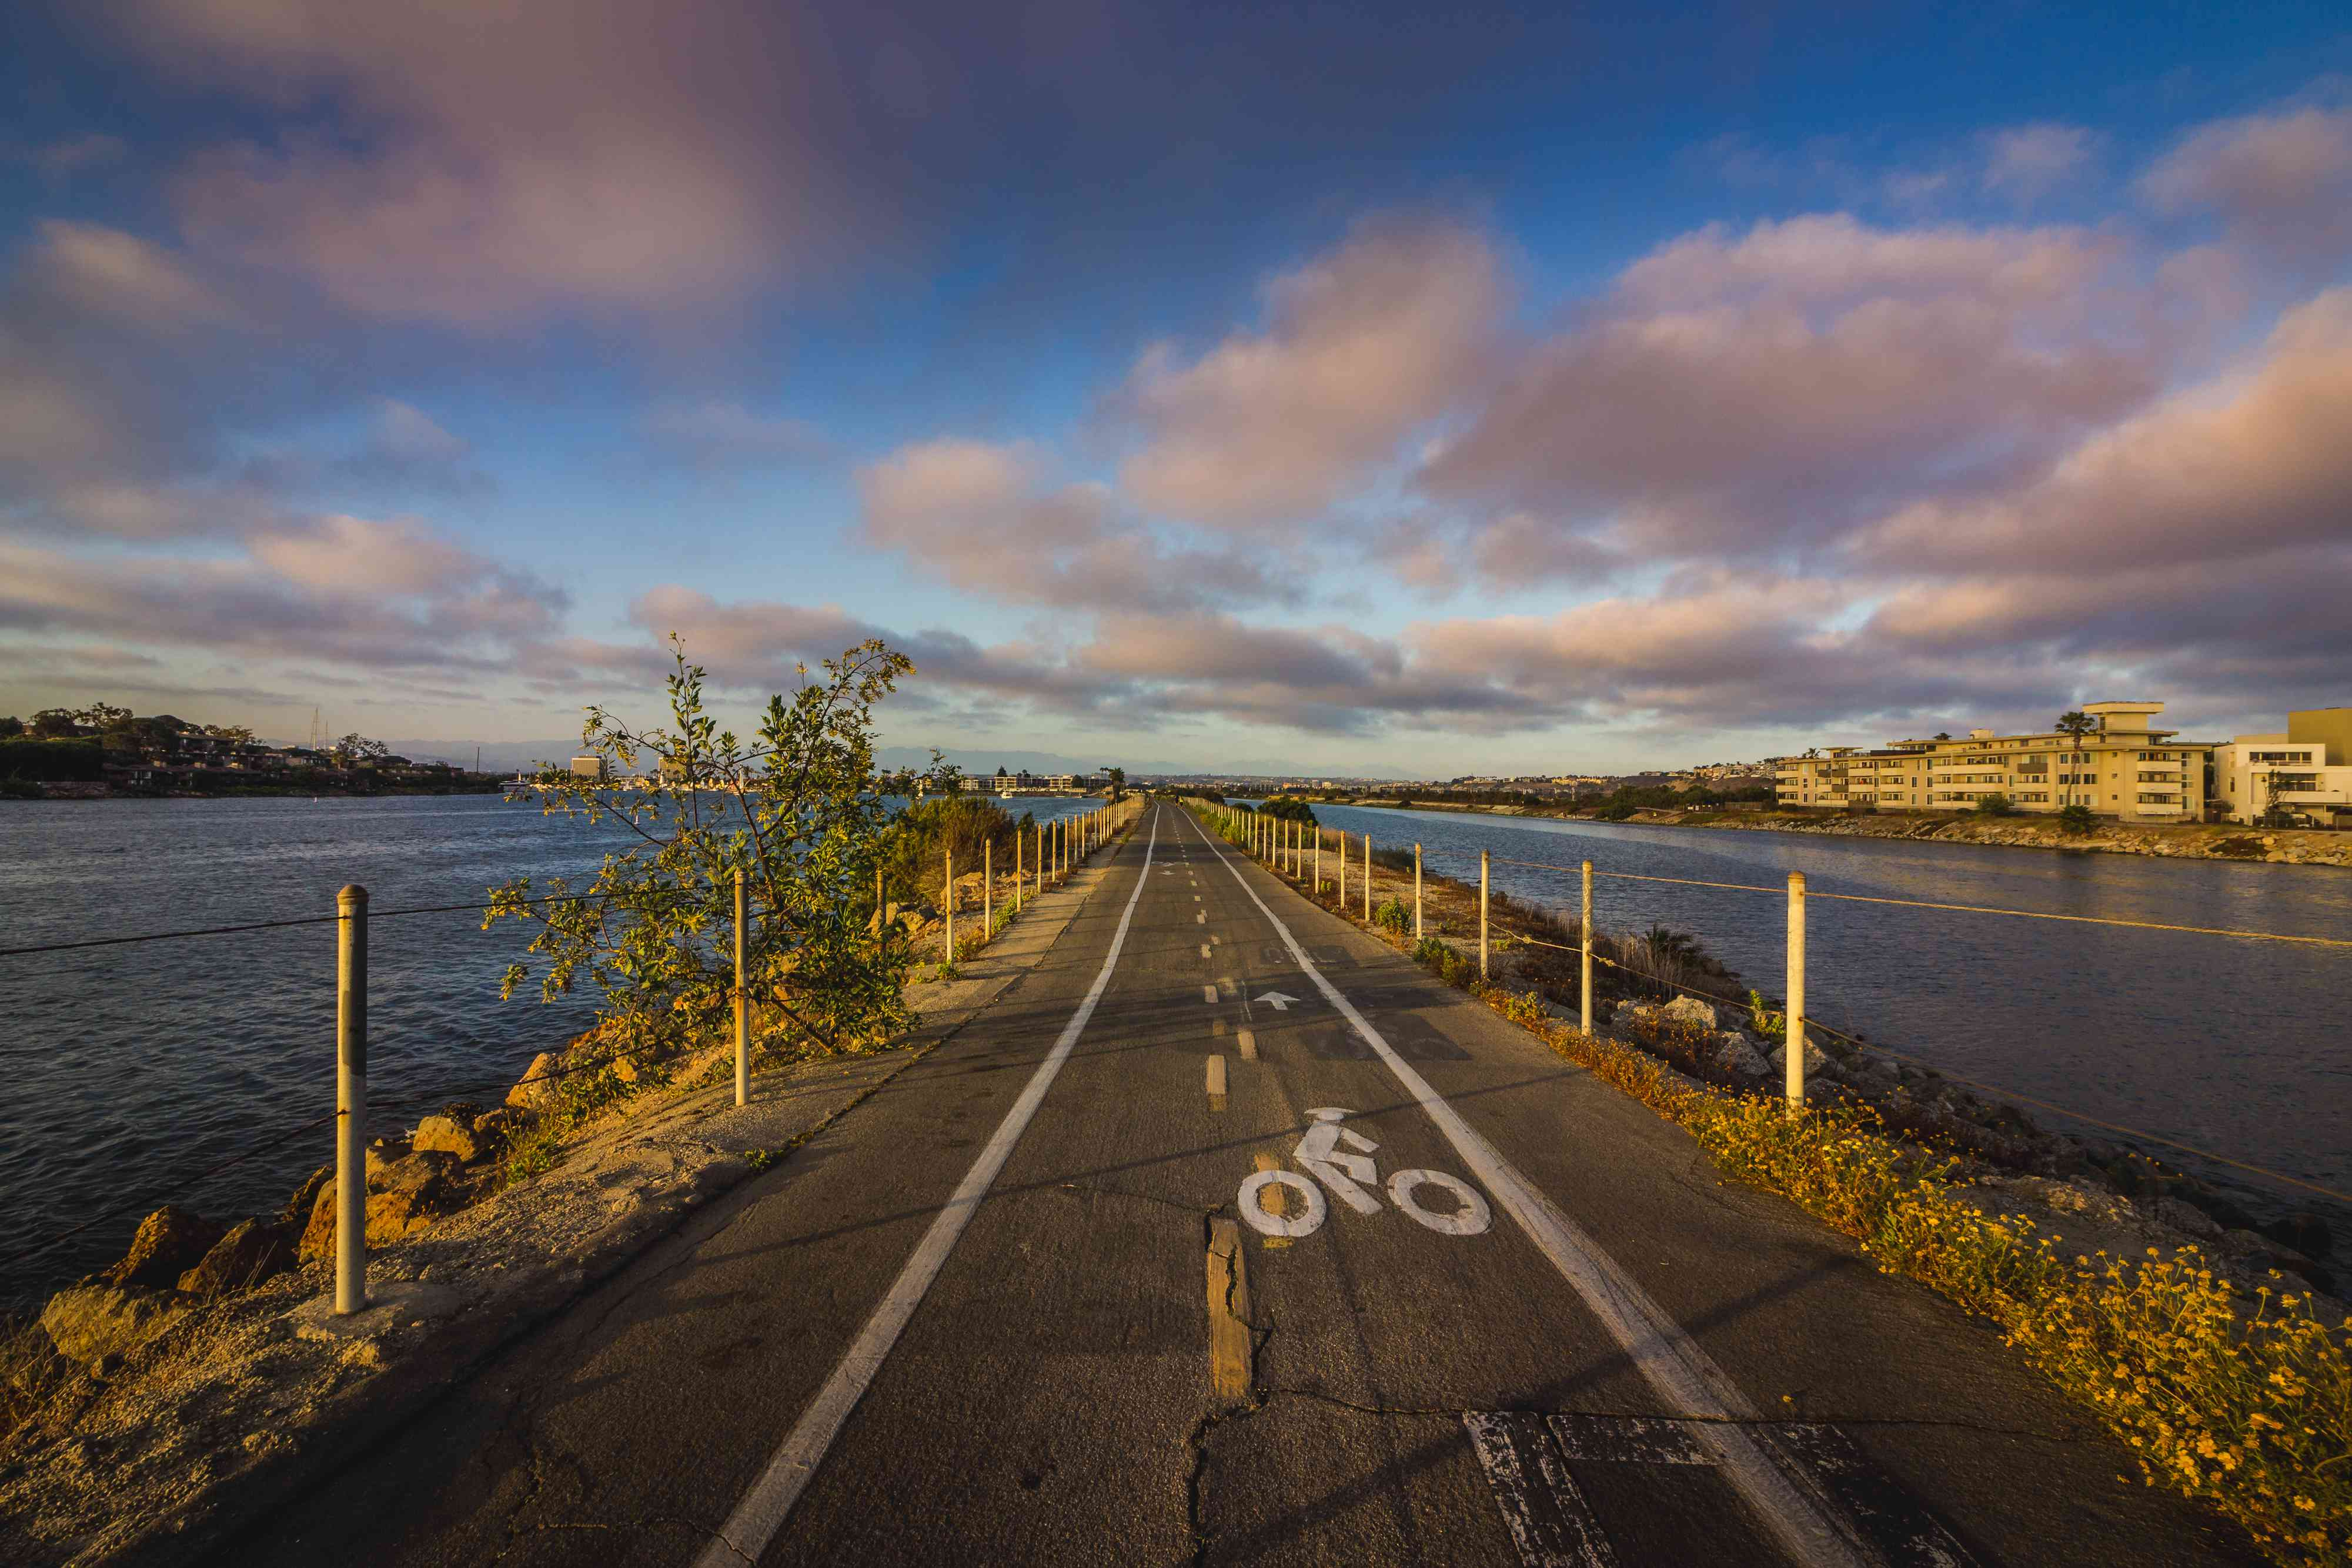 Ballona Creek Bike Path